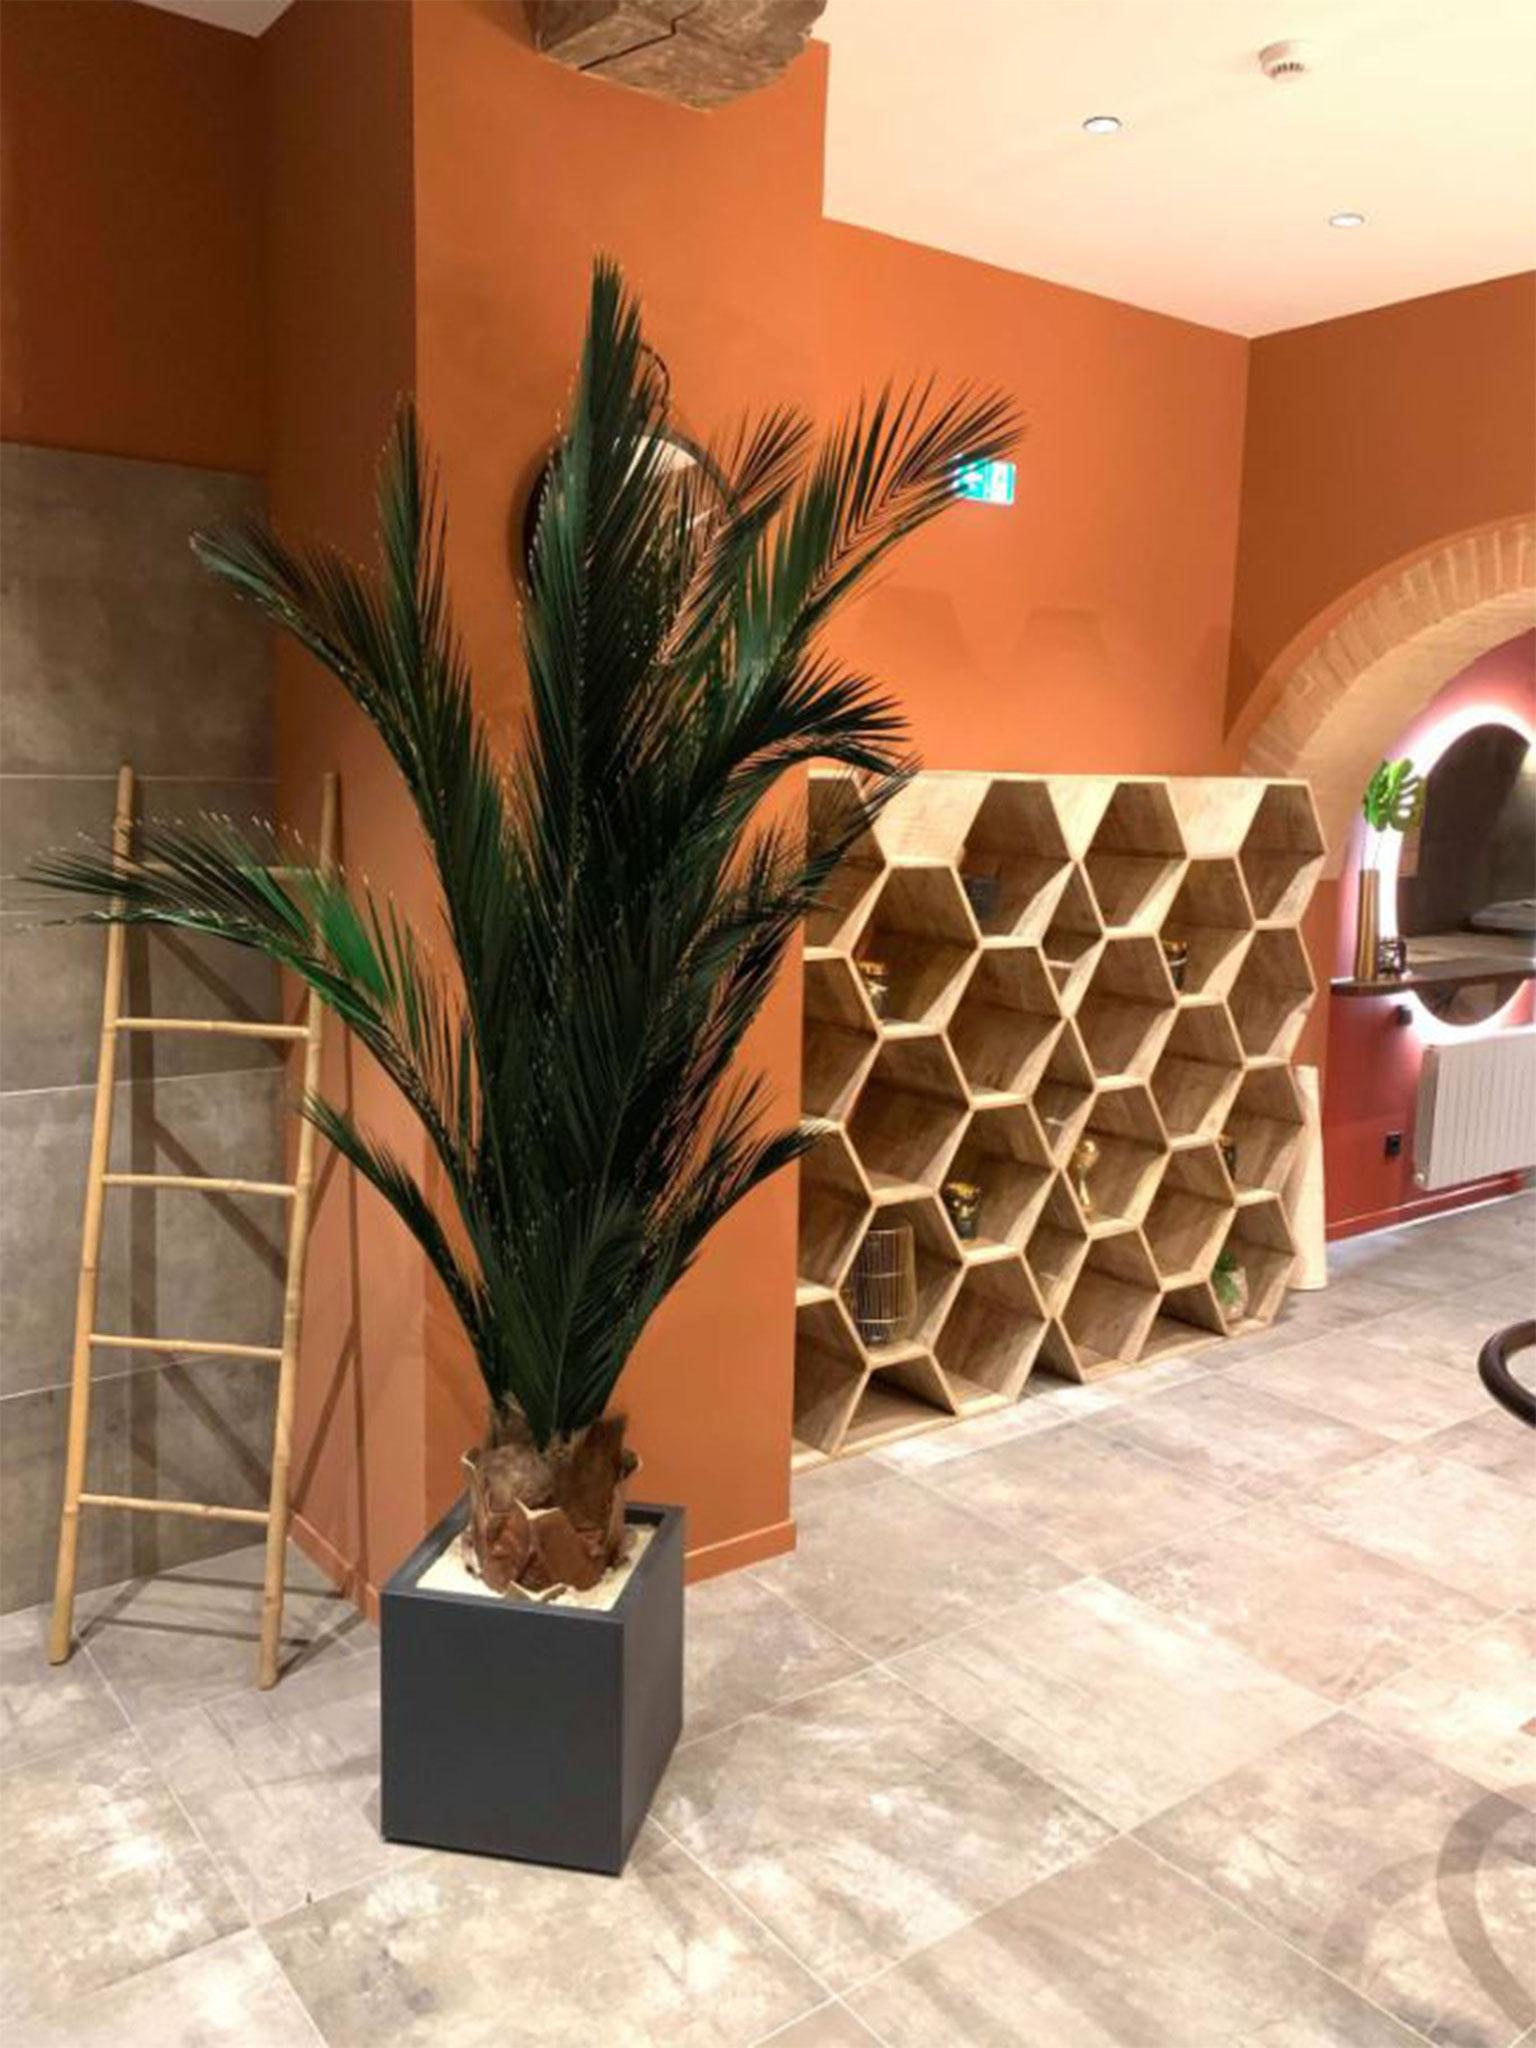 Plantes (RAPHAEL PERRIER)